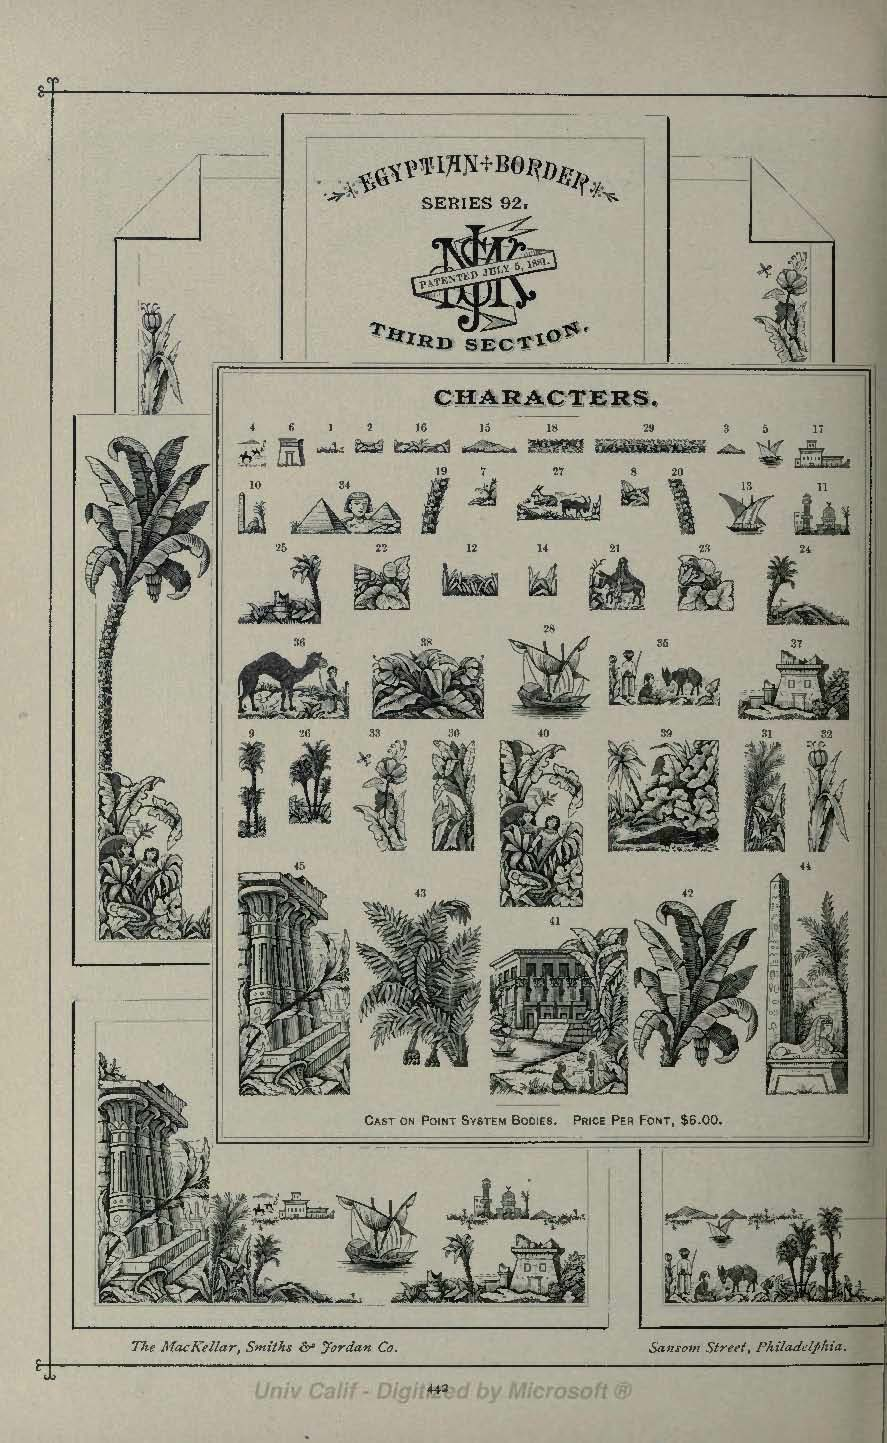 Egyptian Border Third Section from MacKellar Smiths and Jordan 1892 type catalog